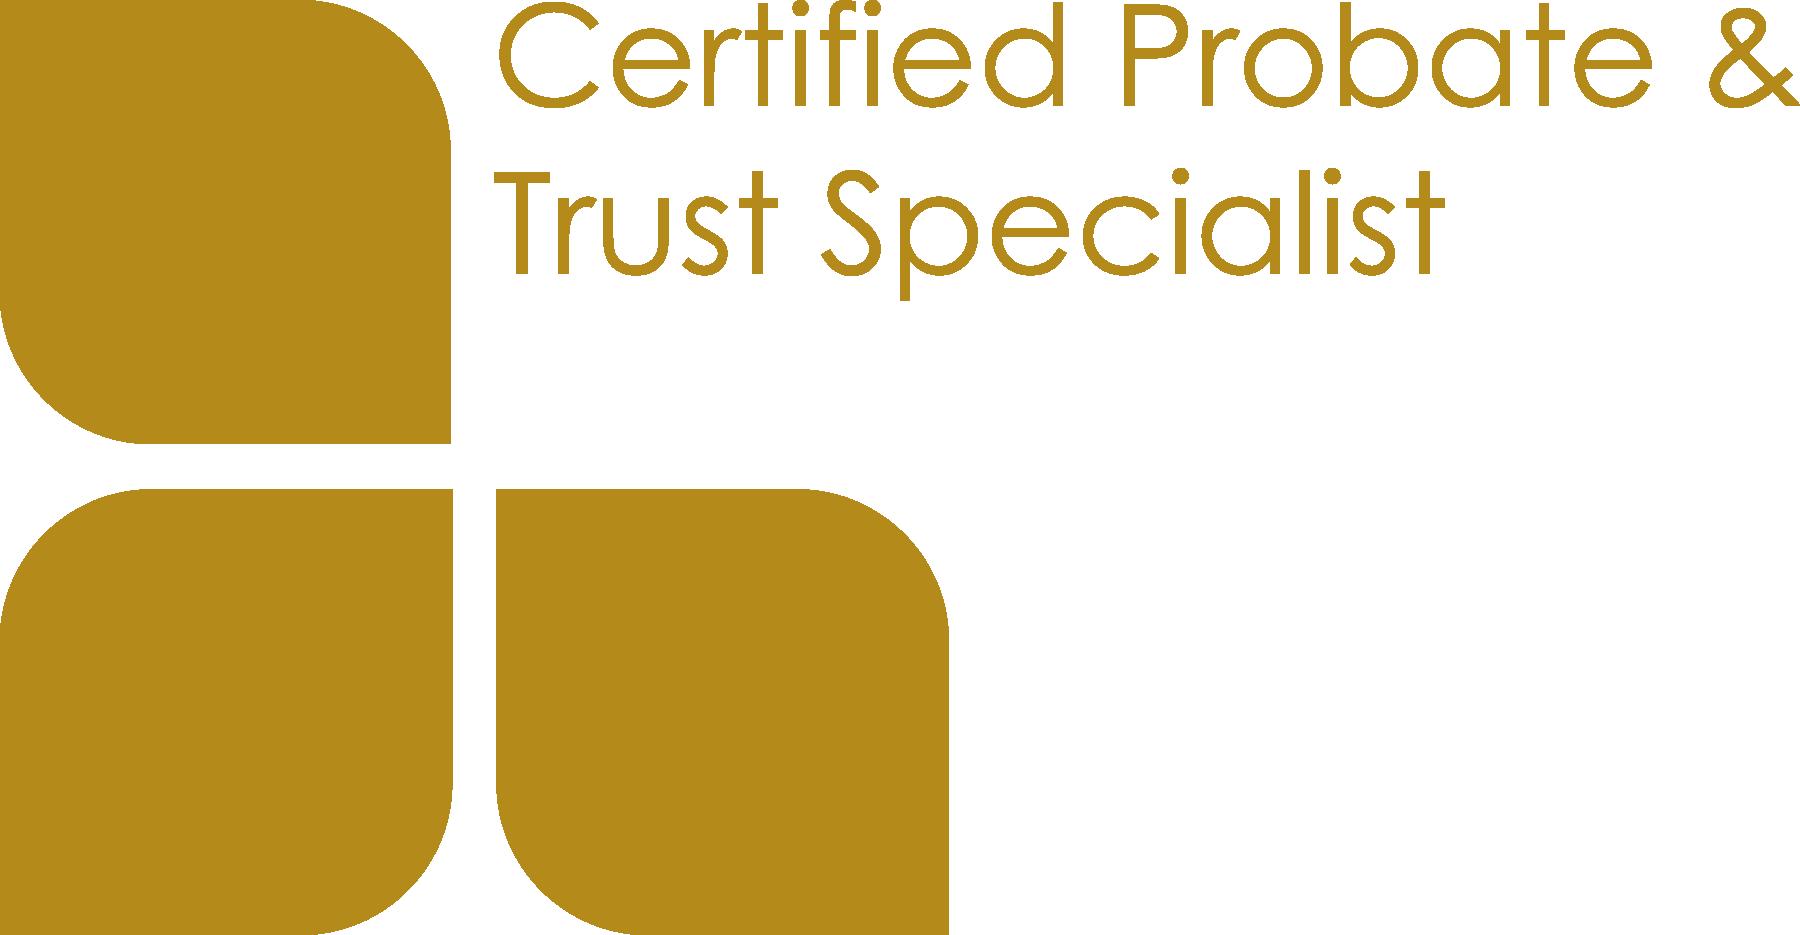 Certified Probate & Trust Specialist